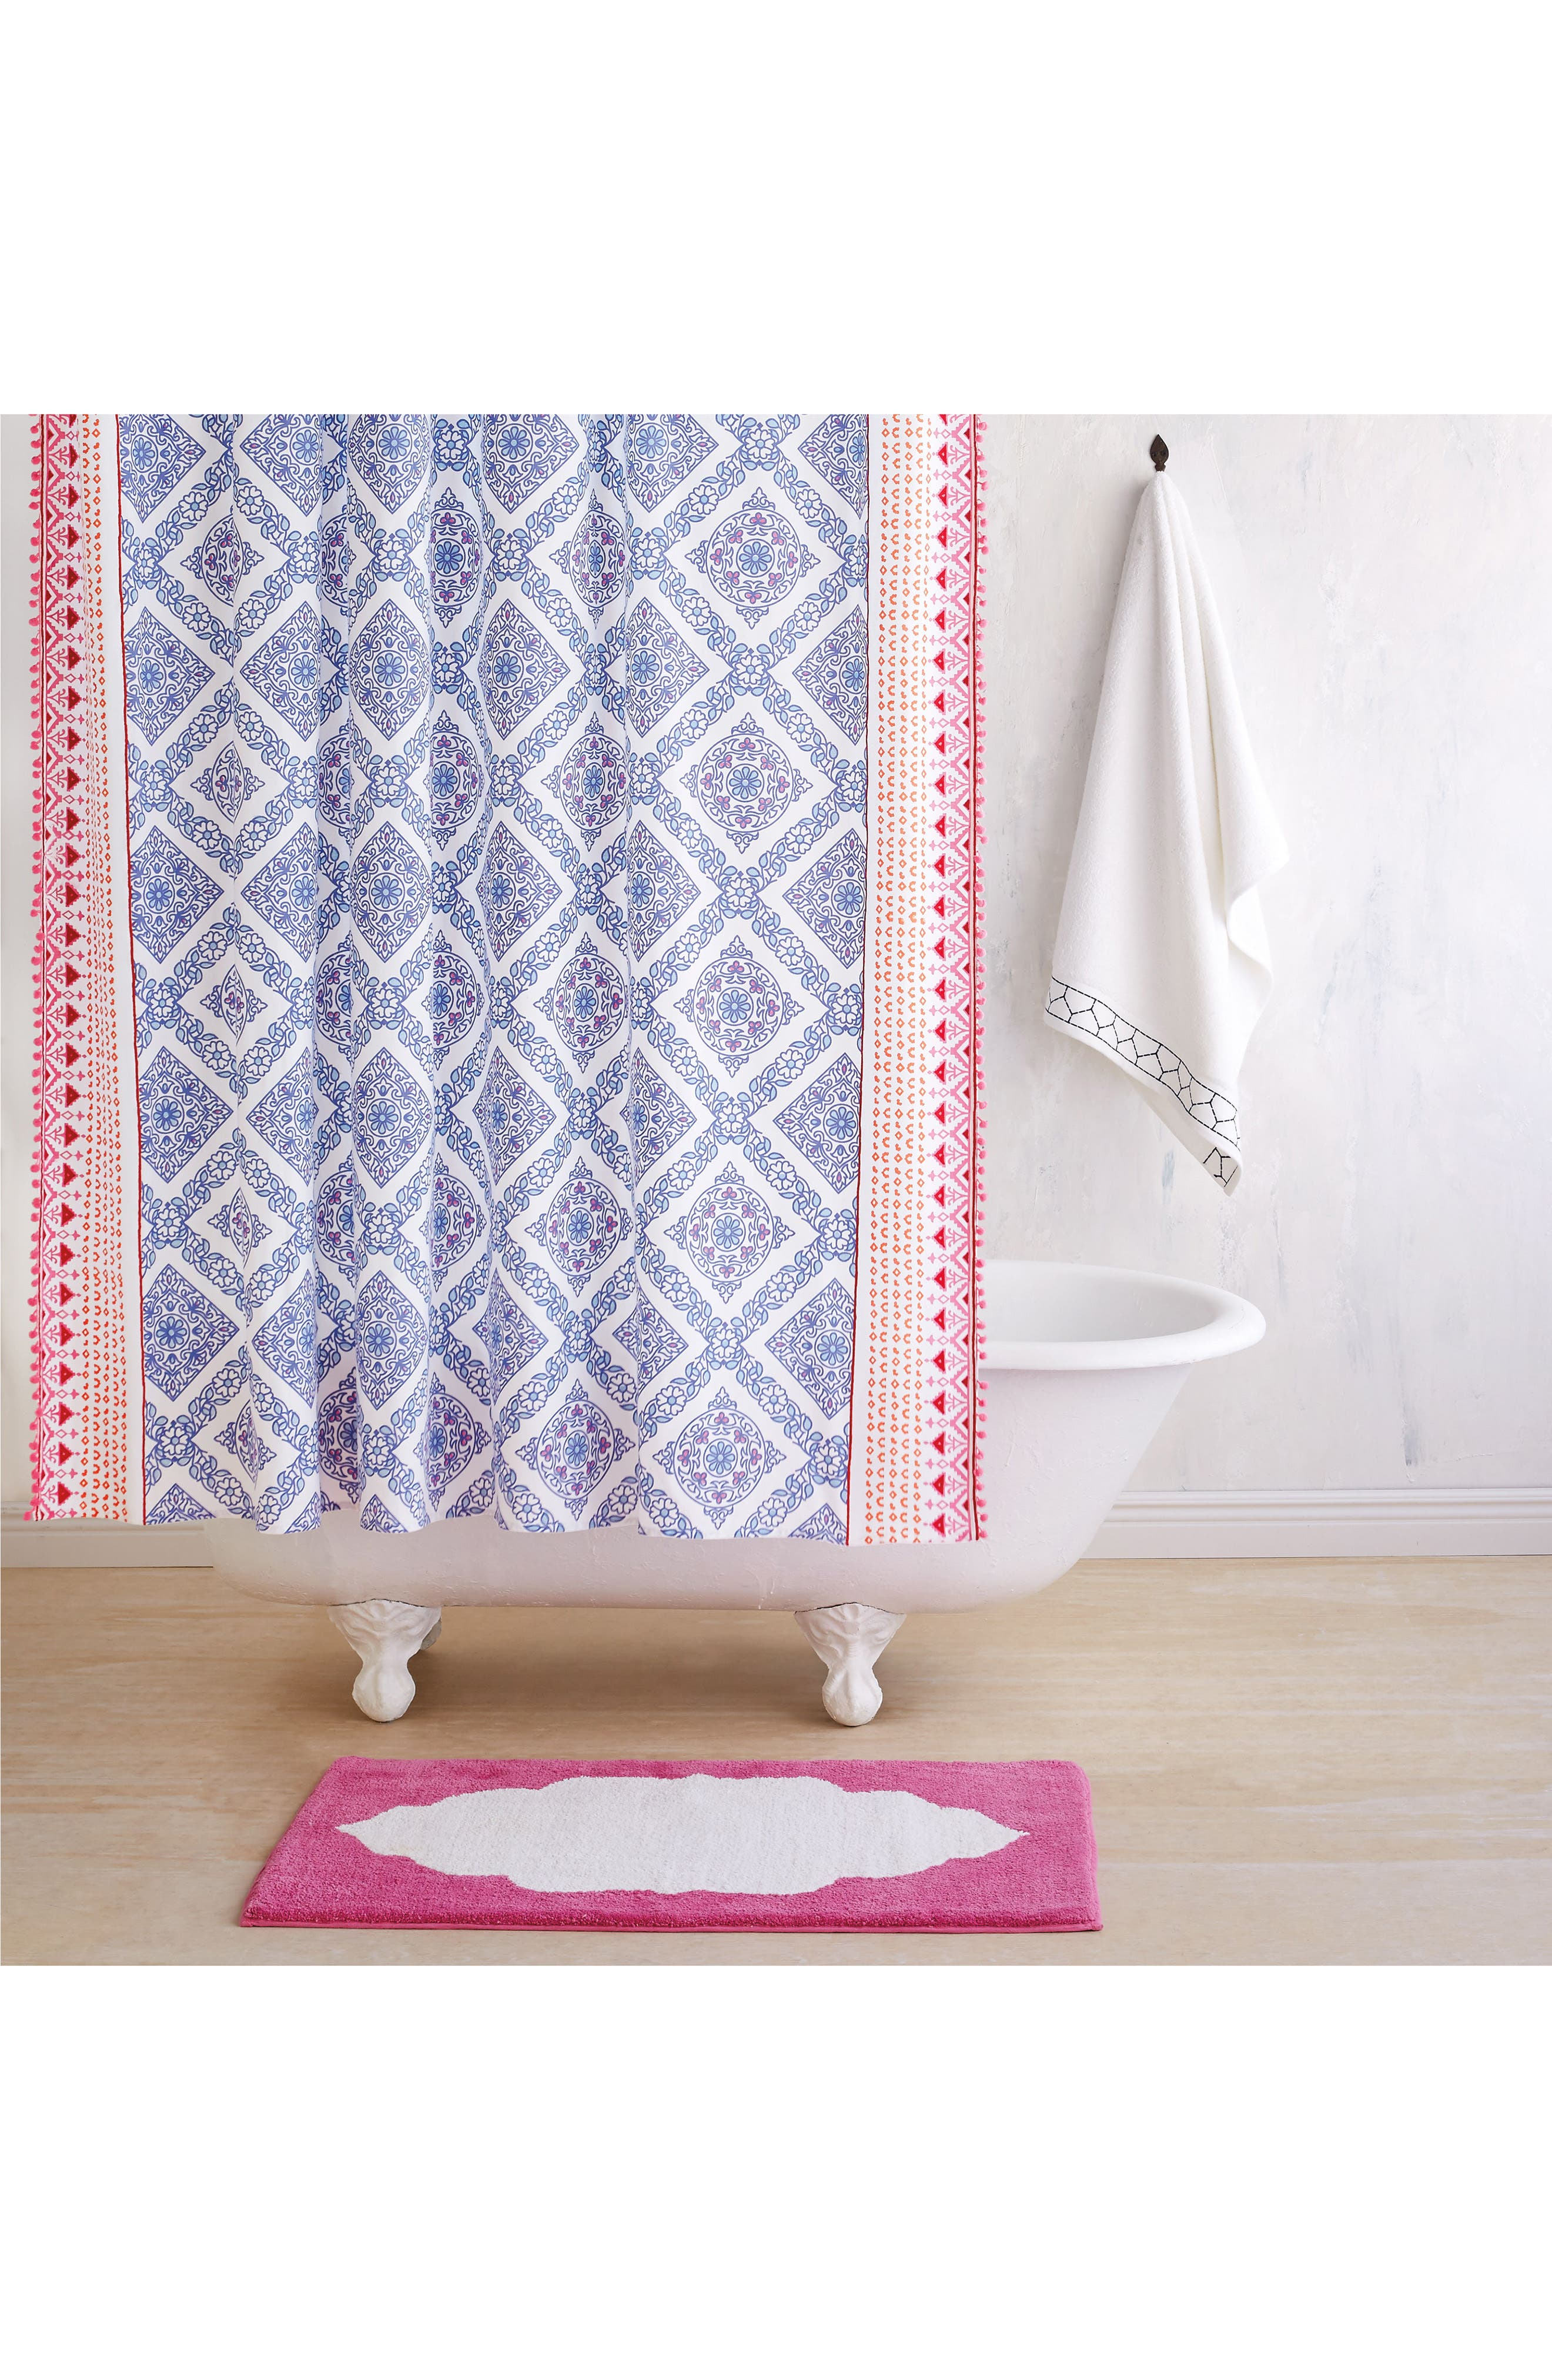 Main Image - John Robshaw Mitta Shower Curtain